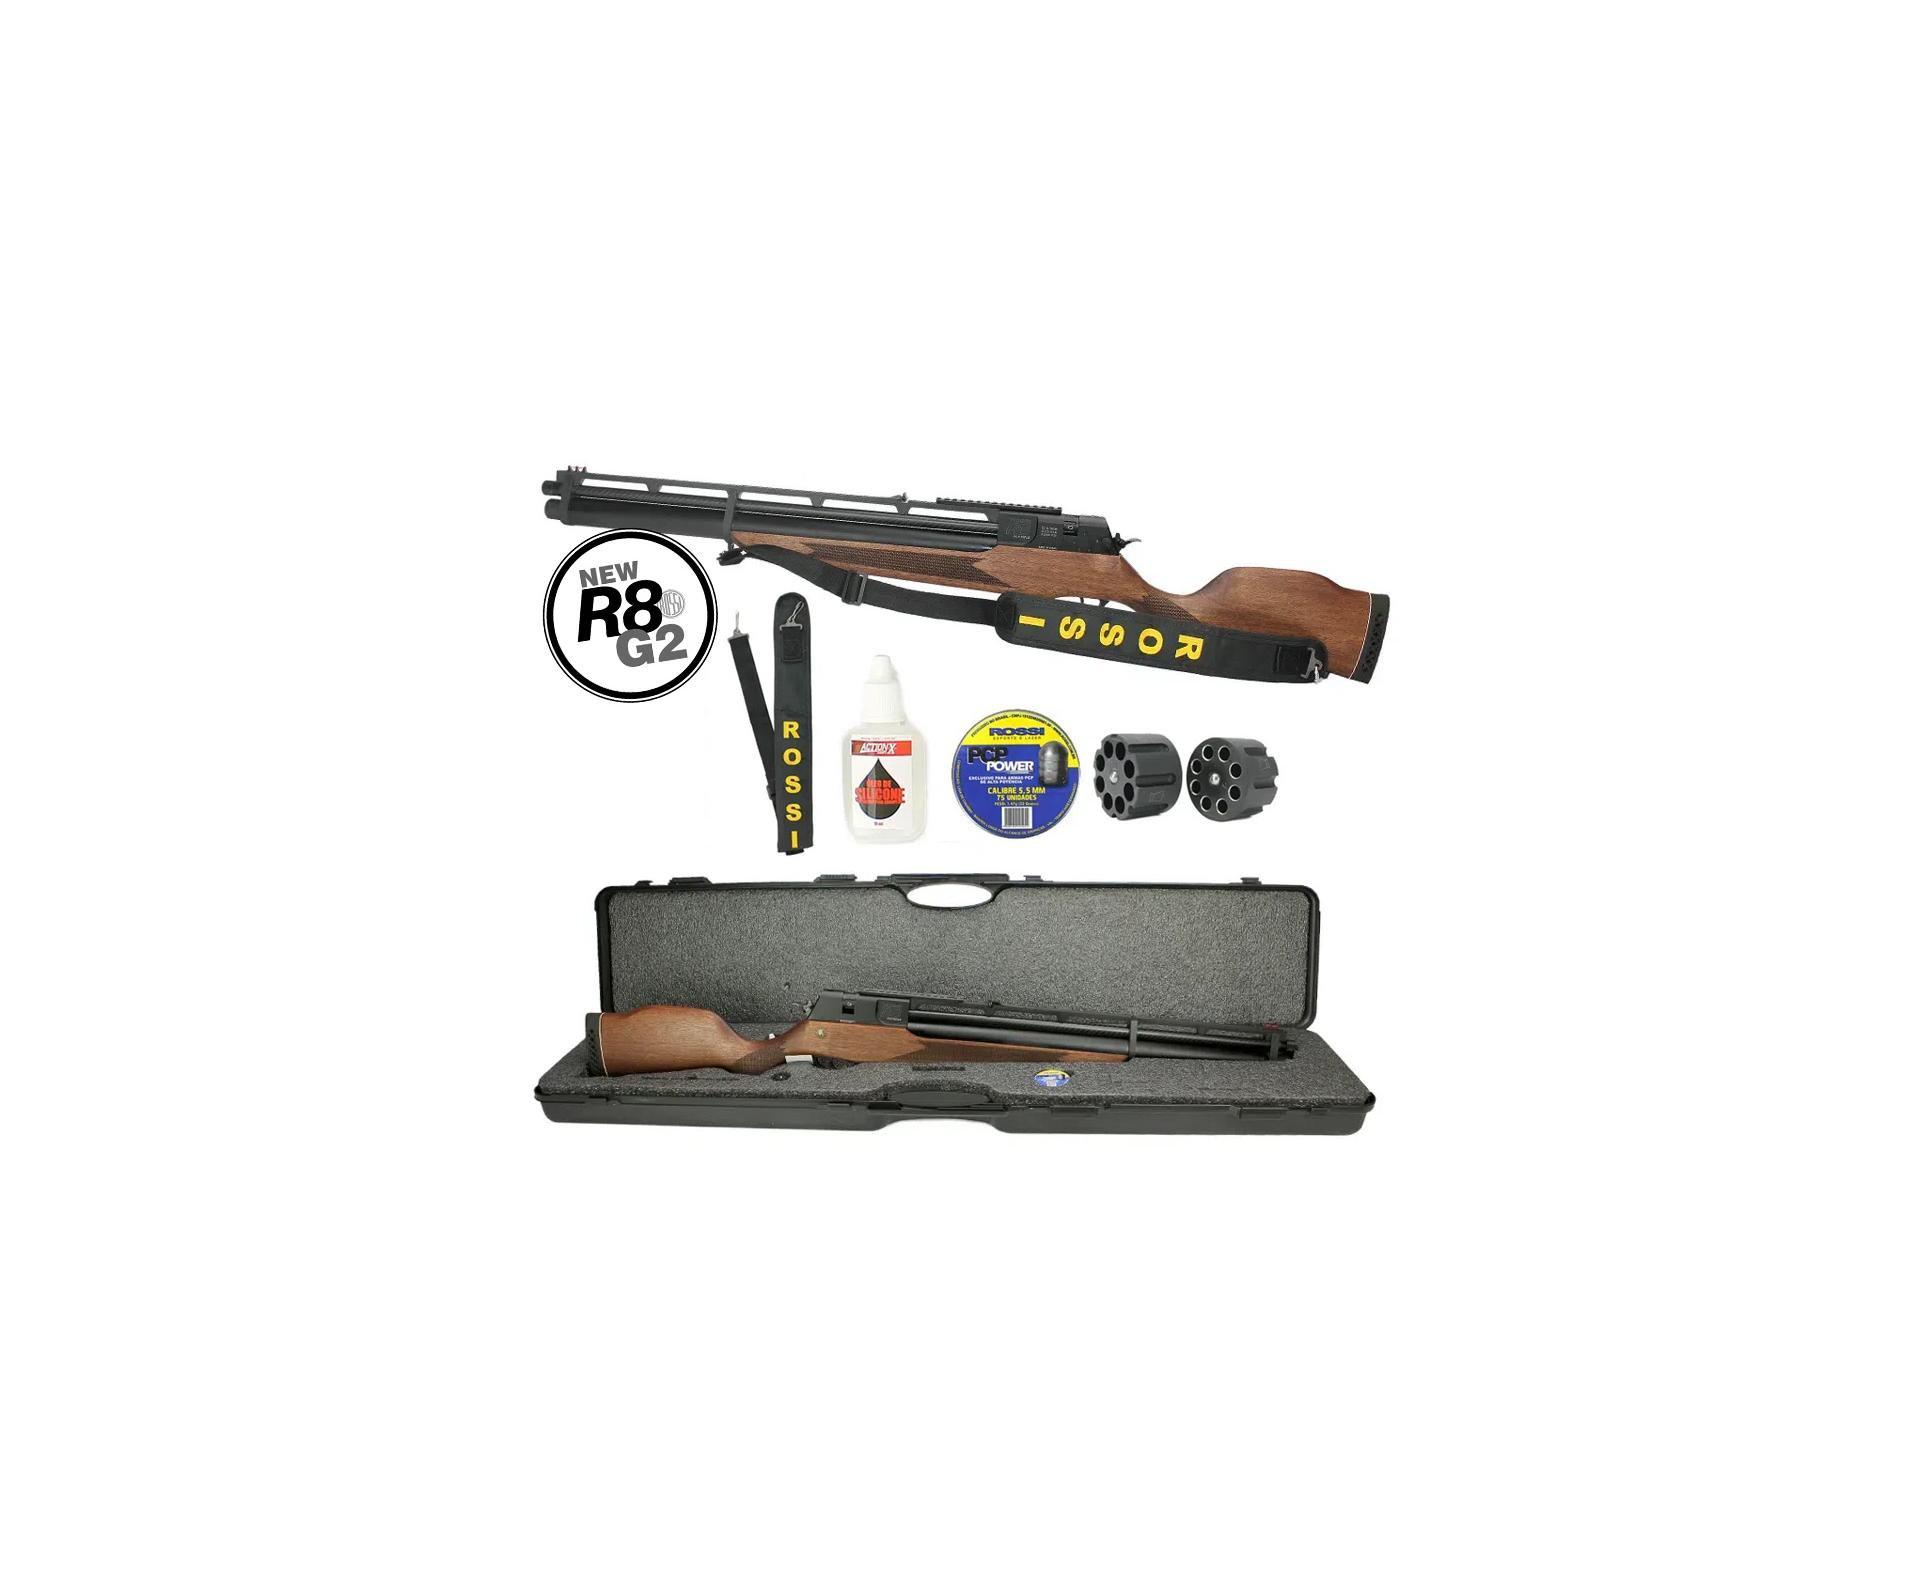 Carabina De Pressão Pcp Rossi R8 5,5mm 8 Tiros 350 M/s